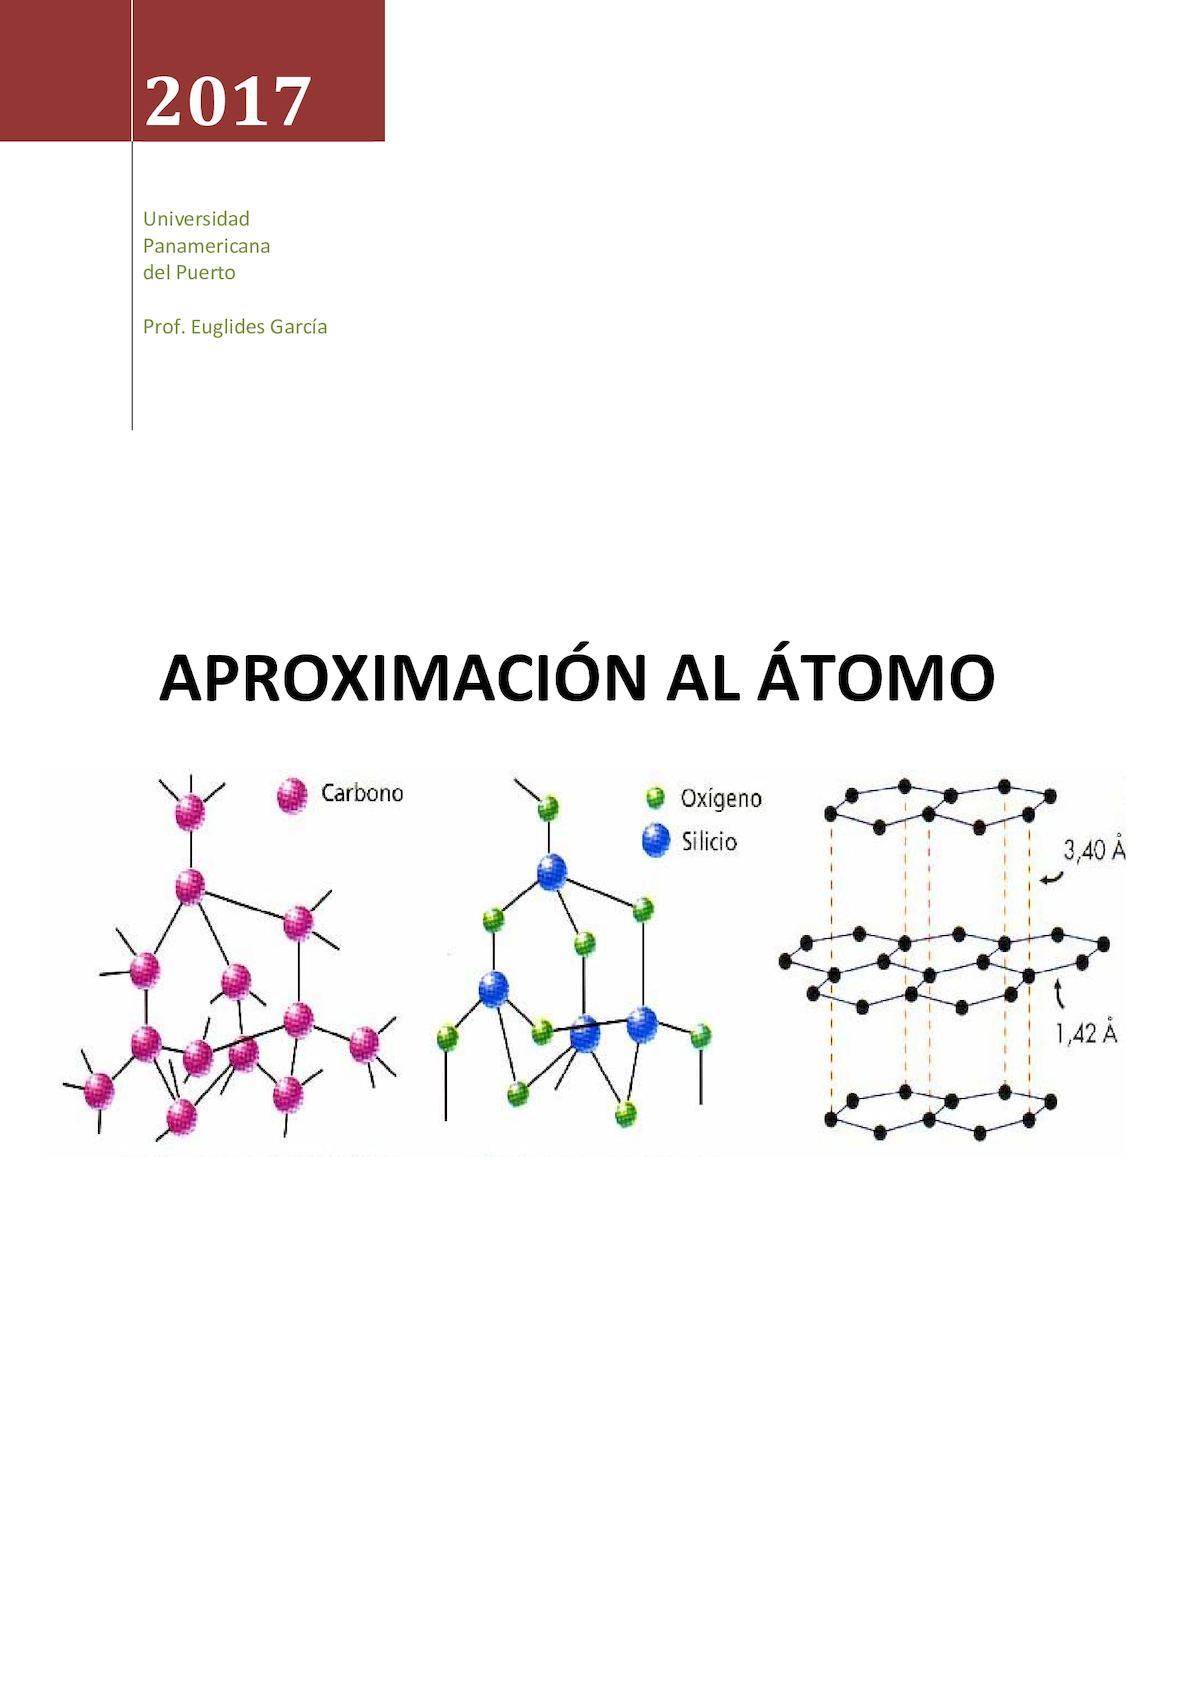 átomos Cloro Cl2 Lewis Wwwmiifotoscom